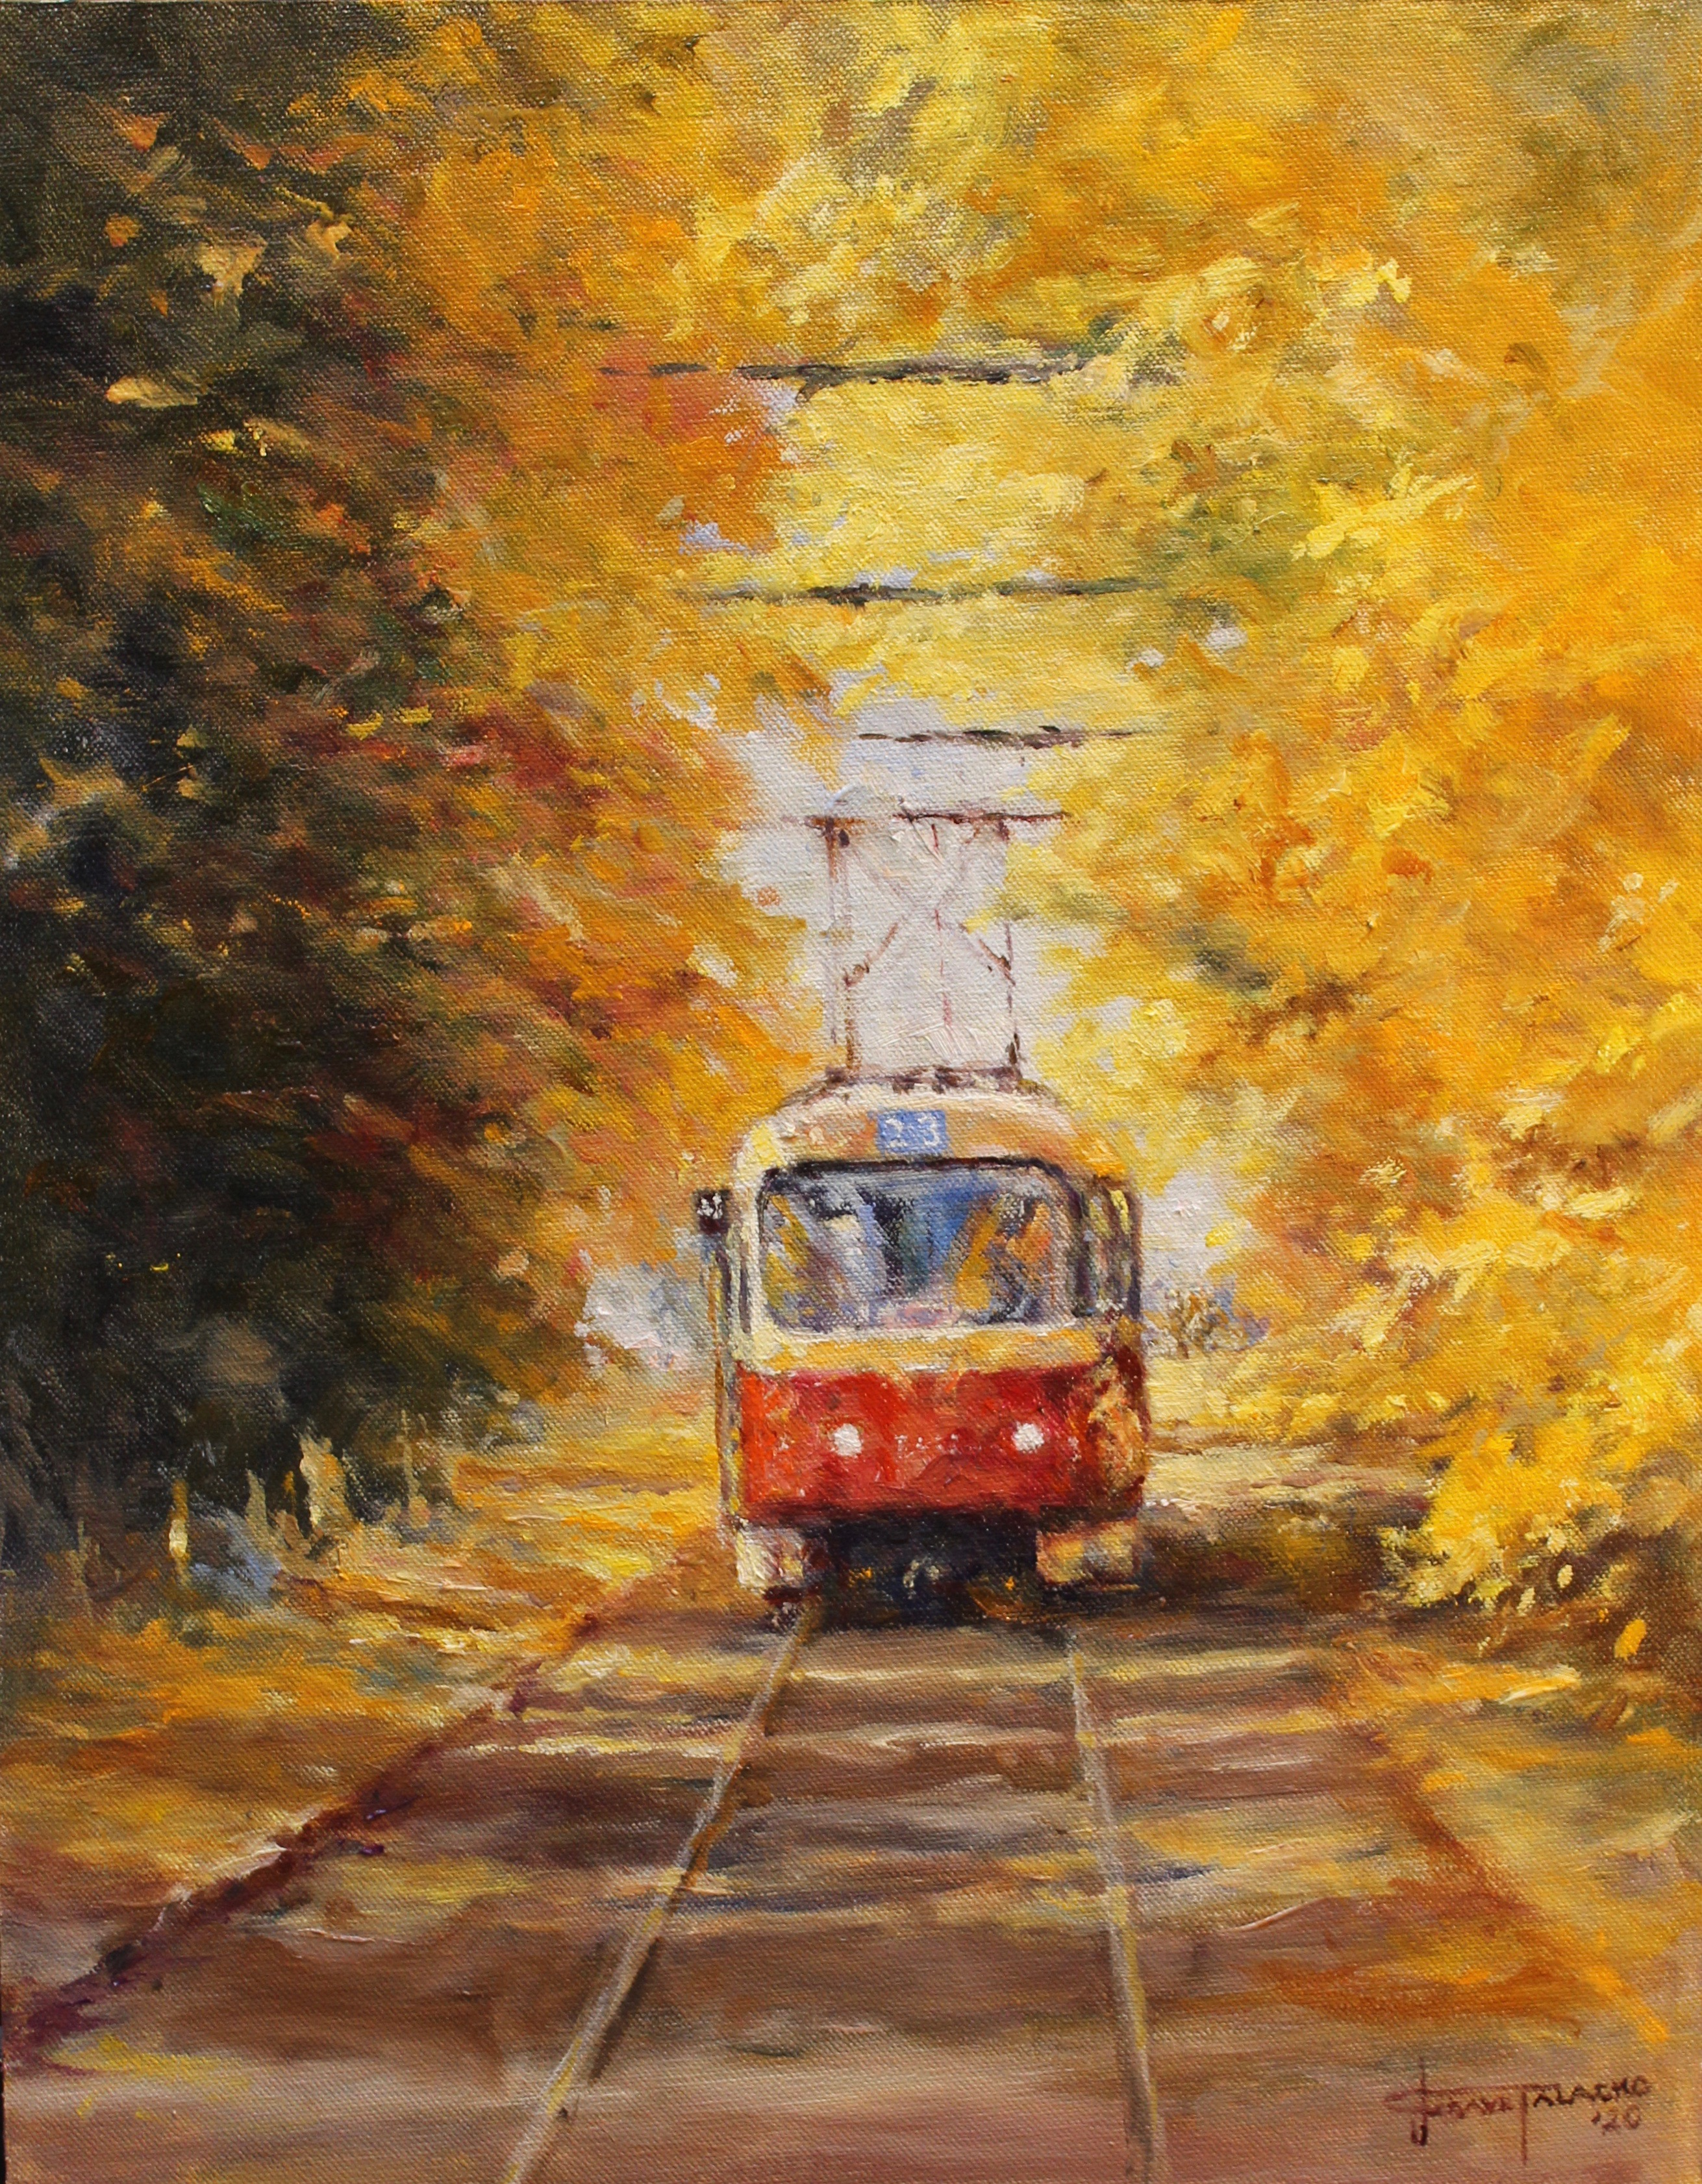 Tram 23